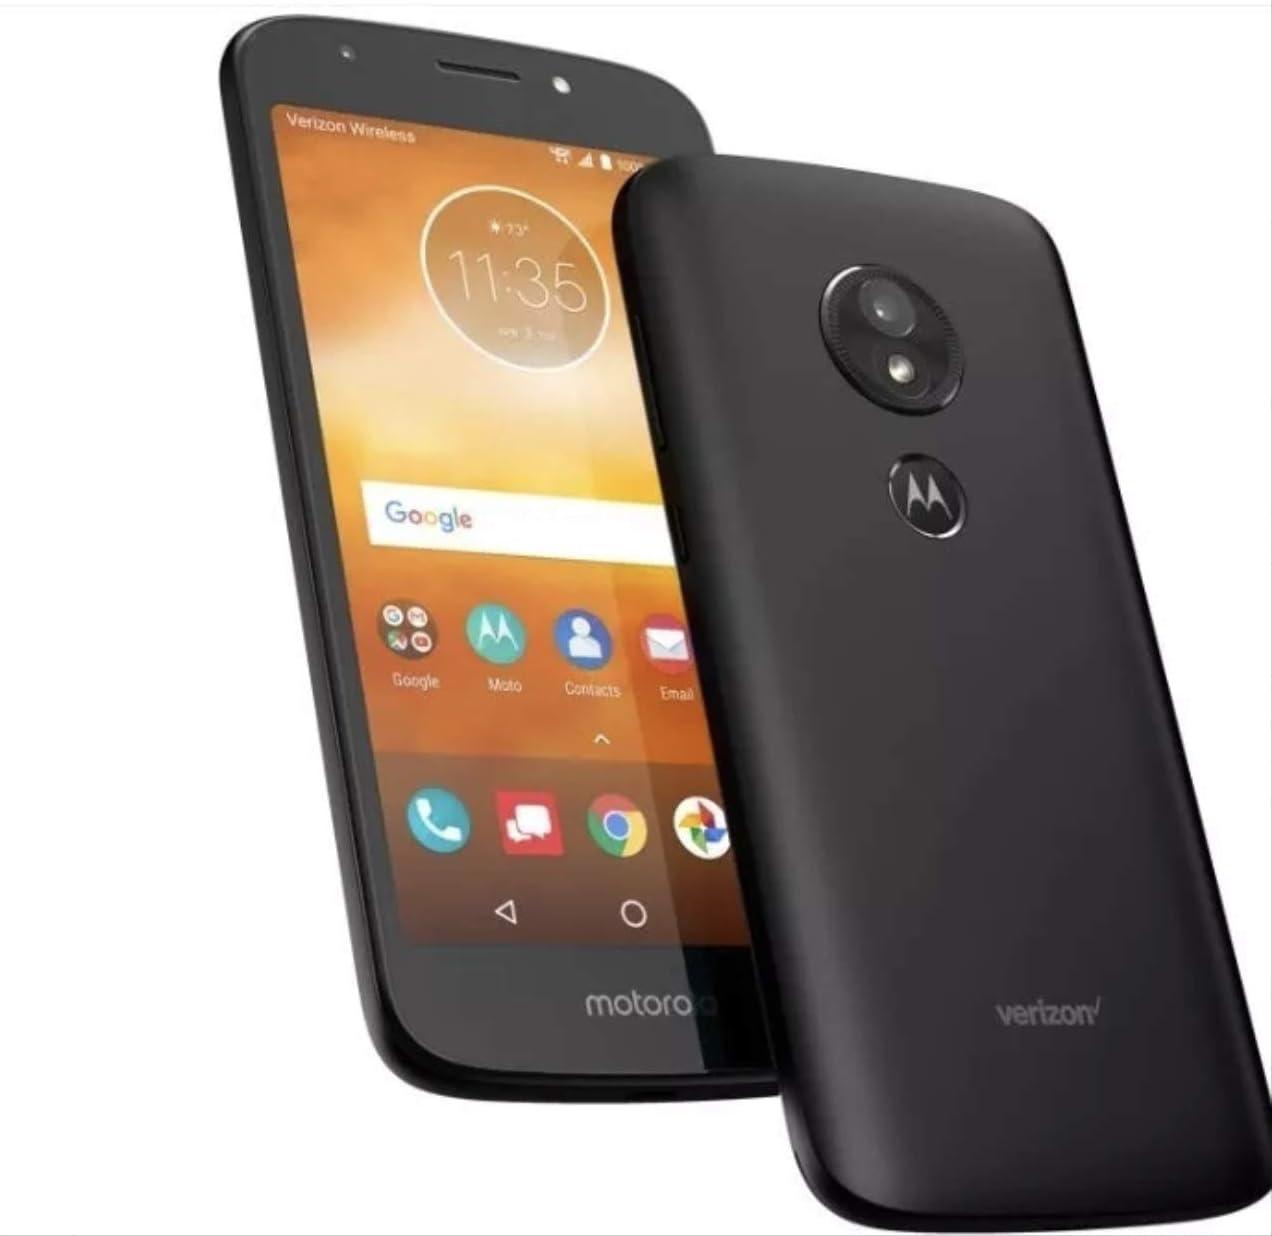 Motorola Moto E5 Play Smartphone 16GB Verizon Wireless Prepaid - Carrier Locked to Verizon Prepaid